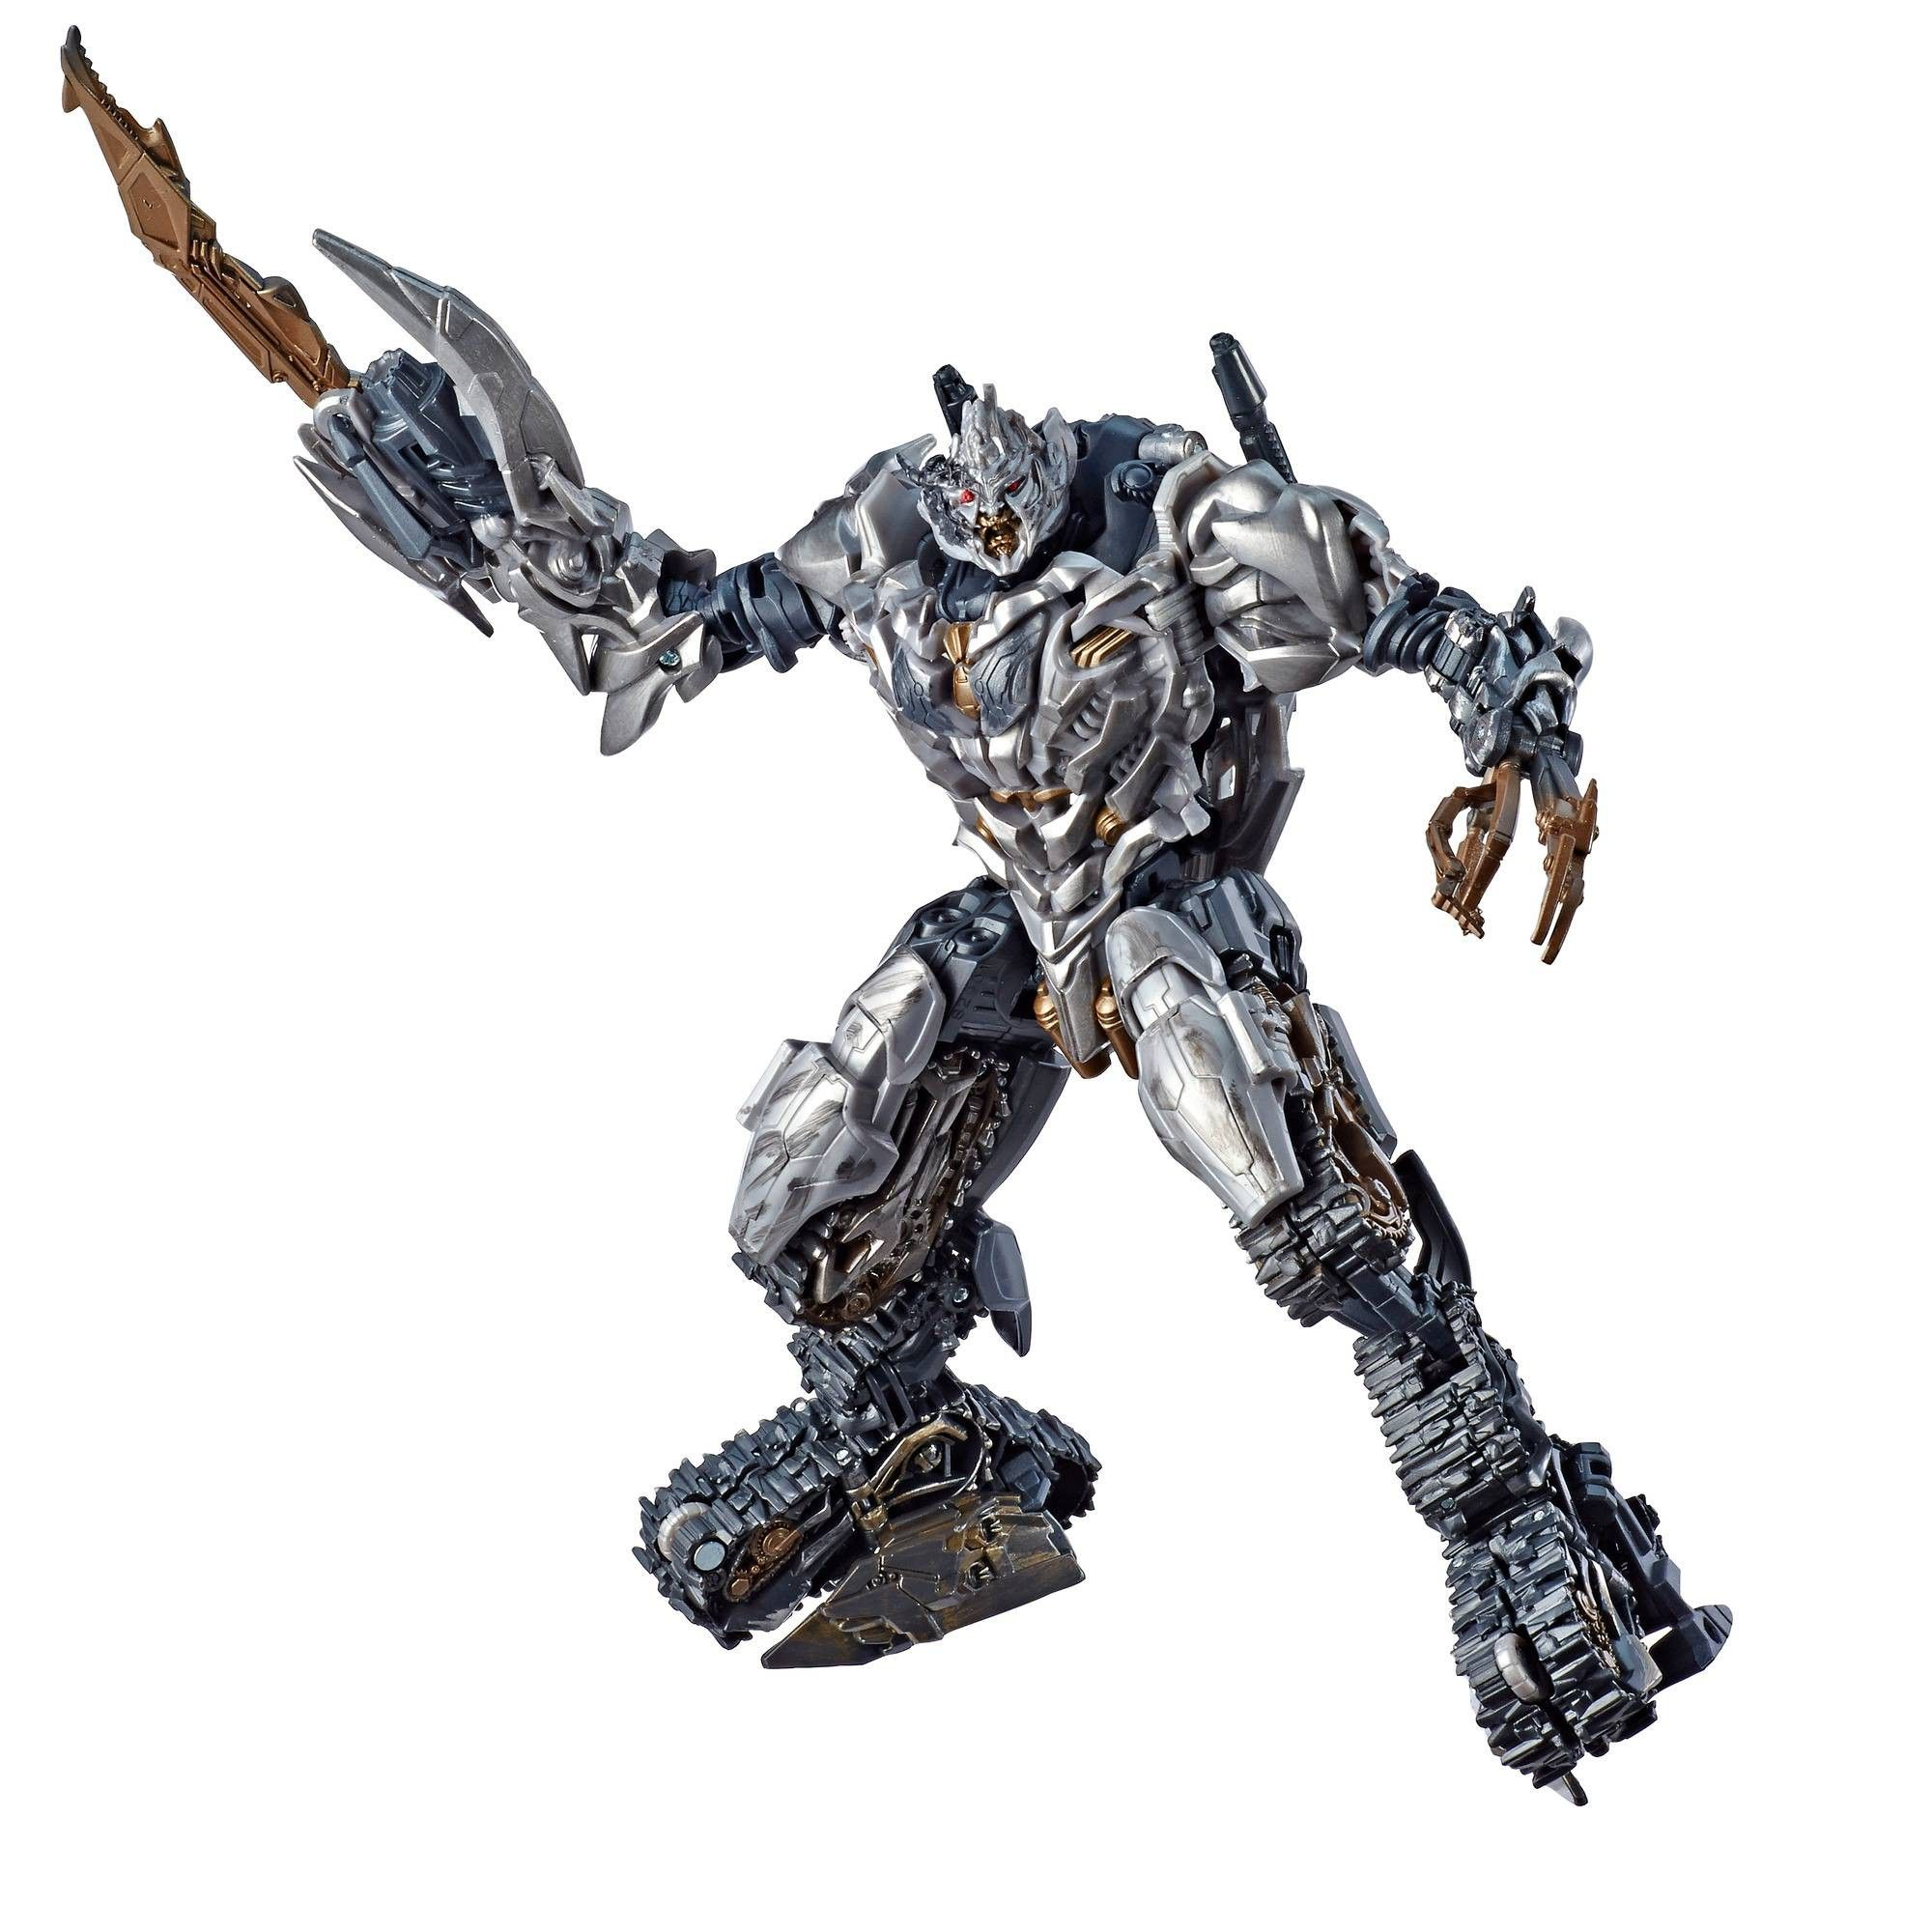 Hasbro Transformers Studio Series Voyager 31 BATTLE DAMAGED MEGATRON InHand